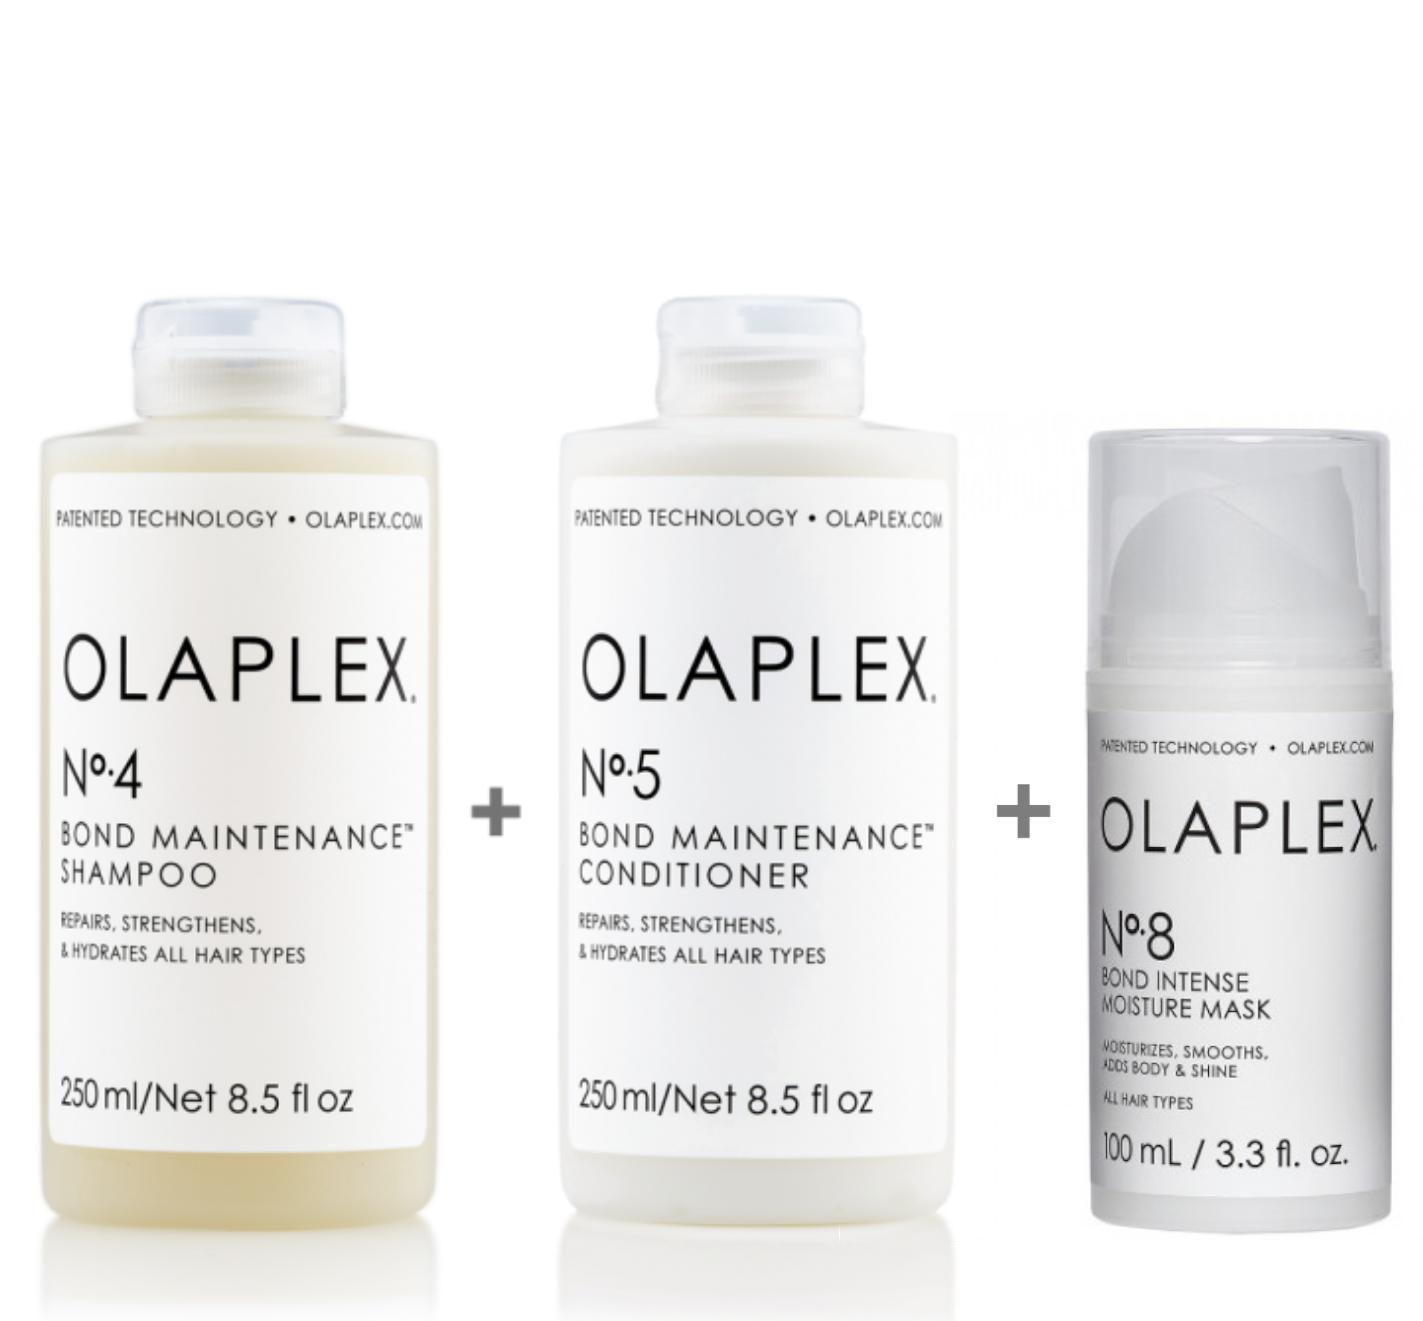 Olaplex Set - Olaplex Bond Maintenance Shampoo No 4 250ml + Olaplex Bond Maintenance Conditioner No 5 250ml + Olaplex Bond Intense Moisture Mask No 8 100ml